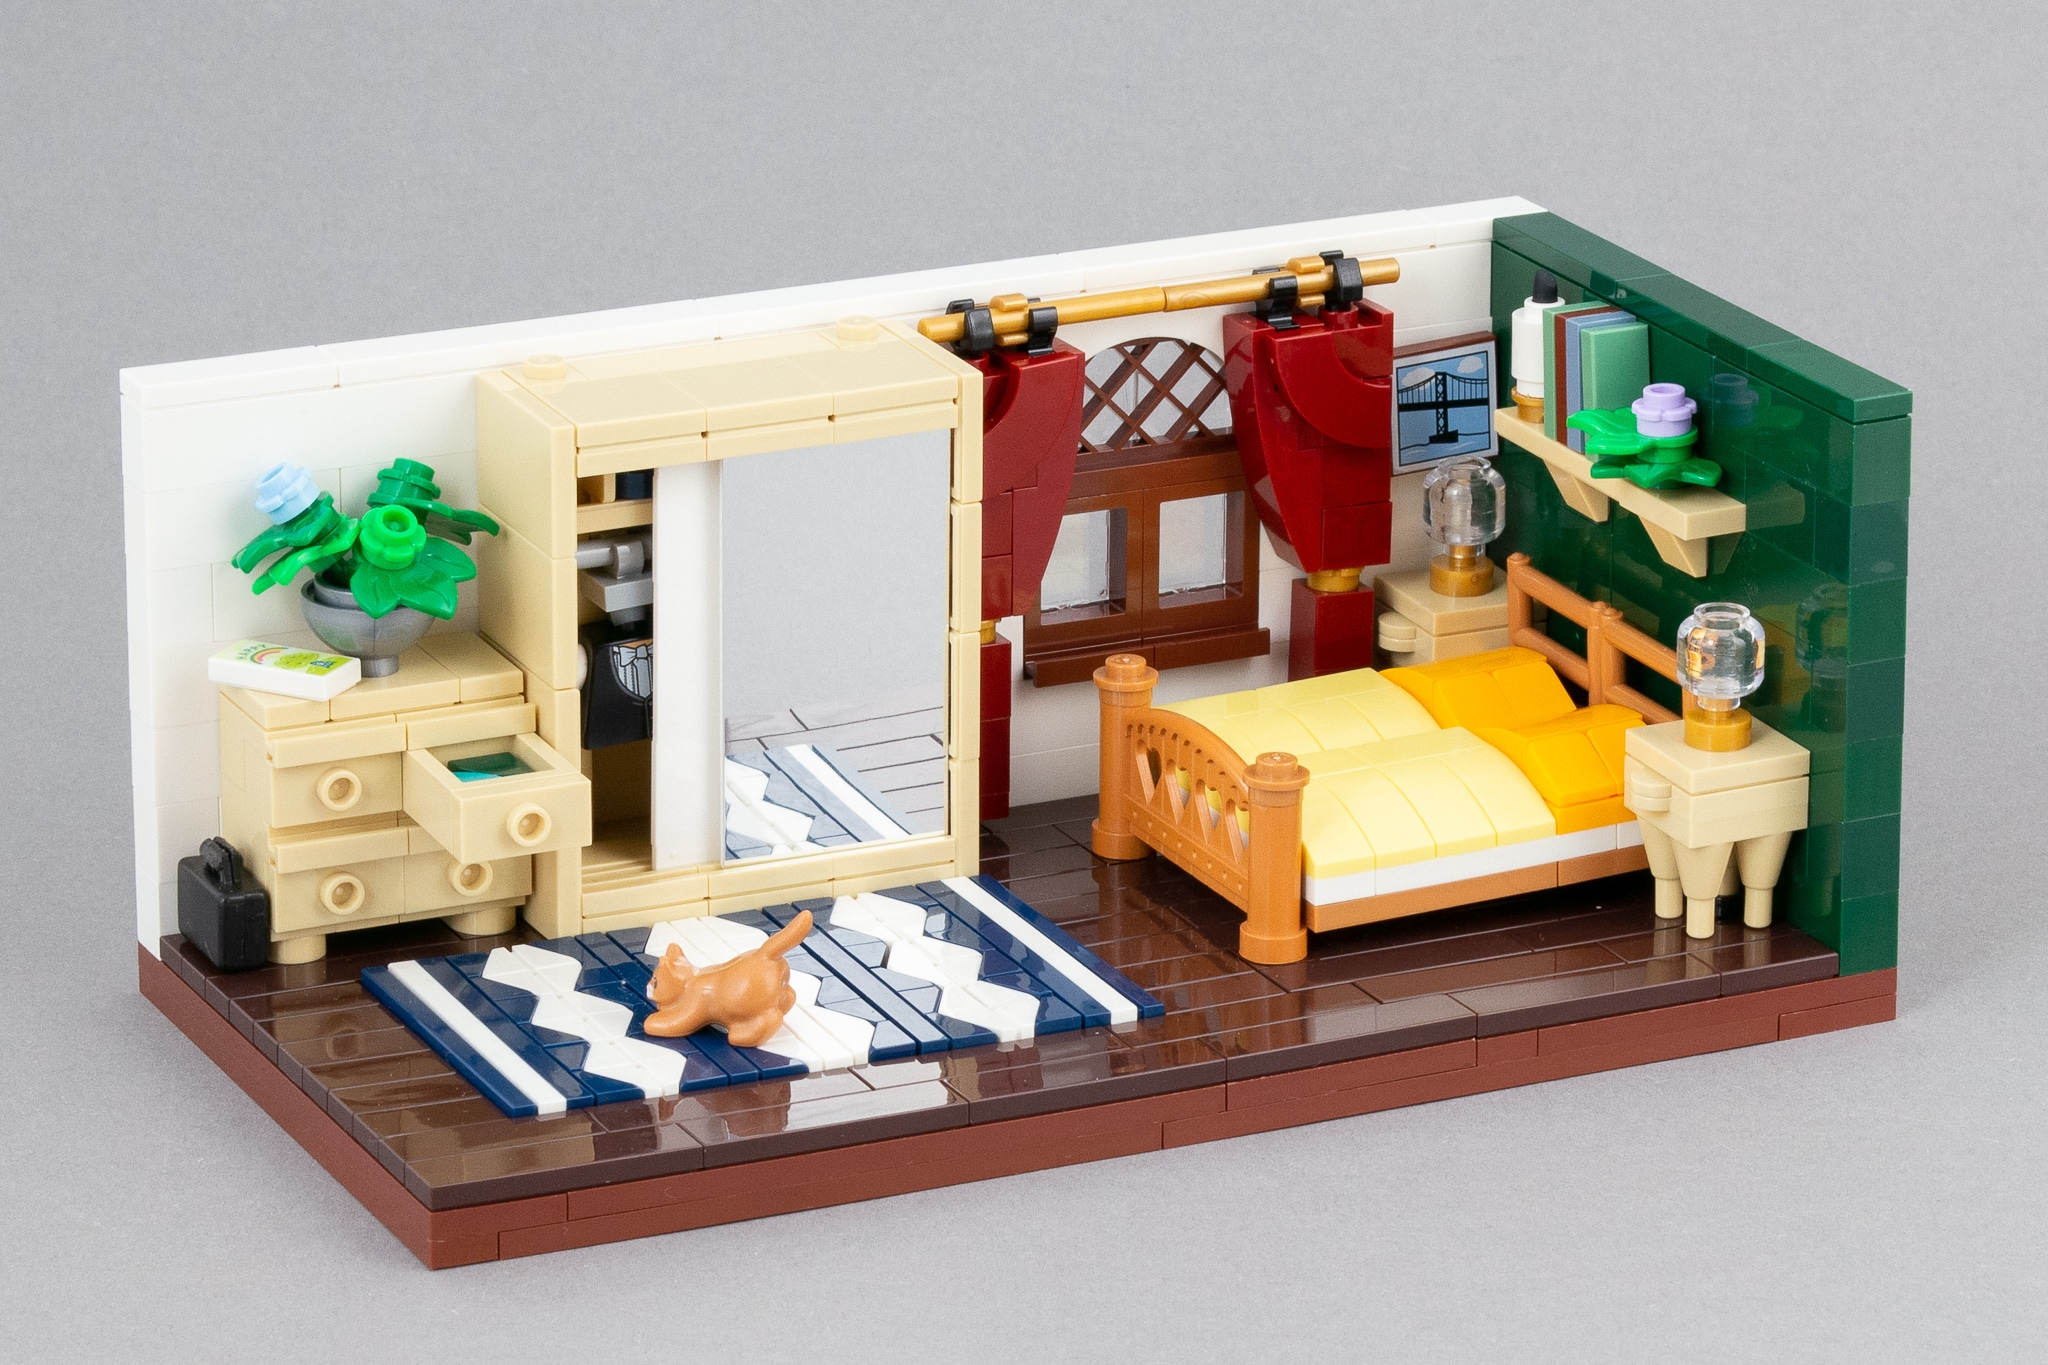 LEGO Schlafzimmer Moc